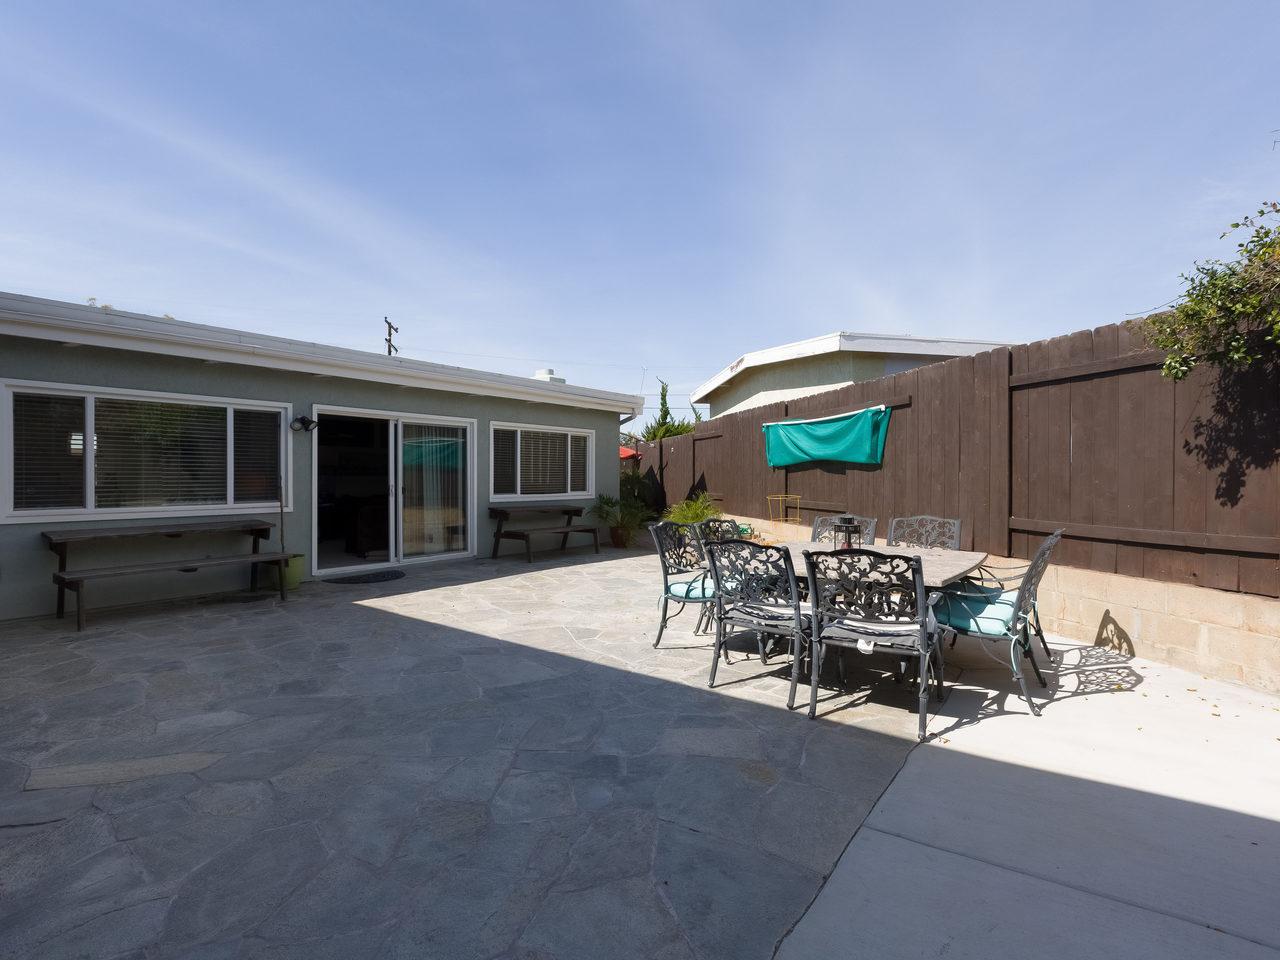 4065 Gros Ventre Ave San Diego-MLS_Size-024-46-4065Gros Ventre 25 of 29-1280x960-72dpi.jpg